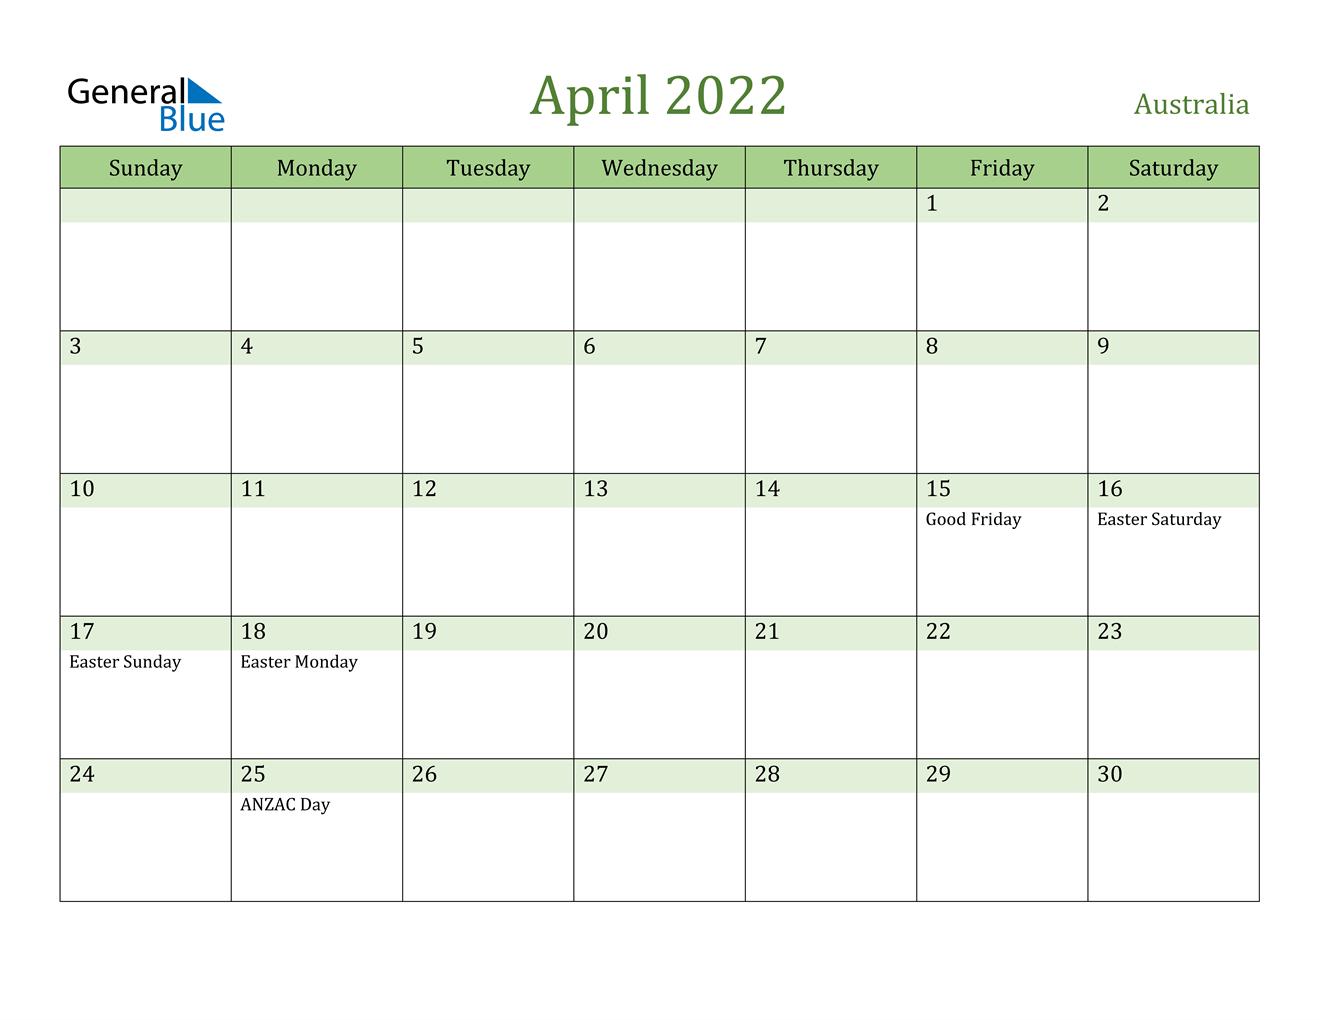 April 2022 Calendar - Australia throughout April 2022 Calendar To Print Photo